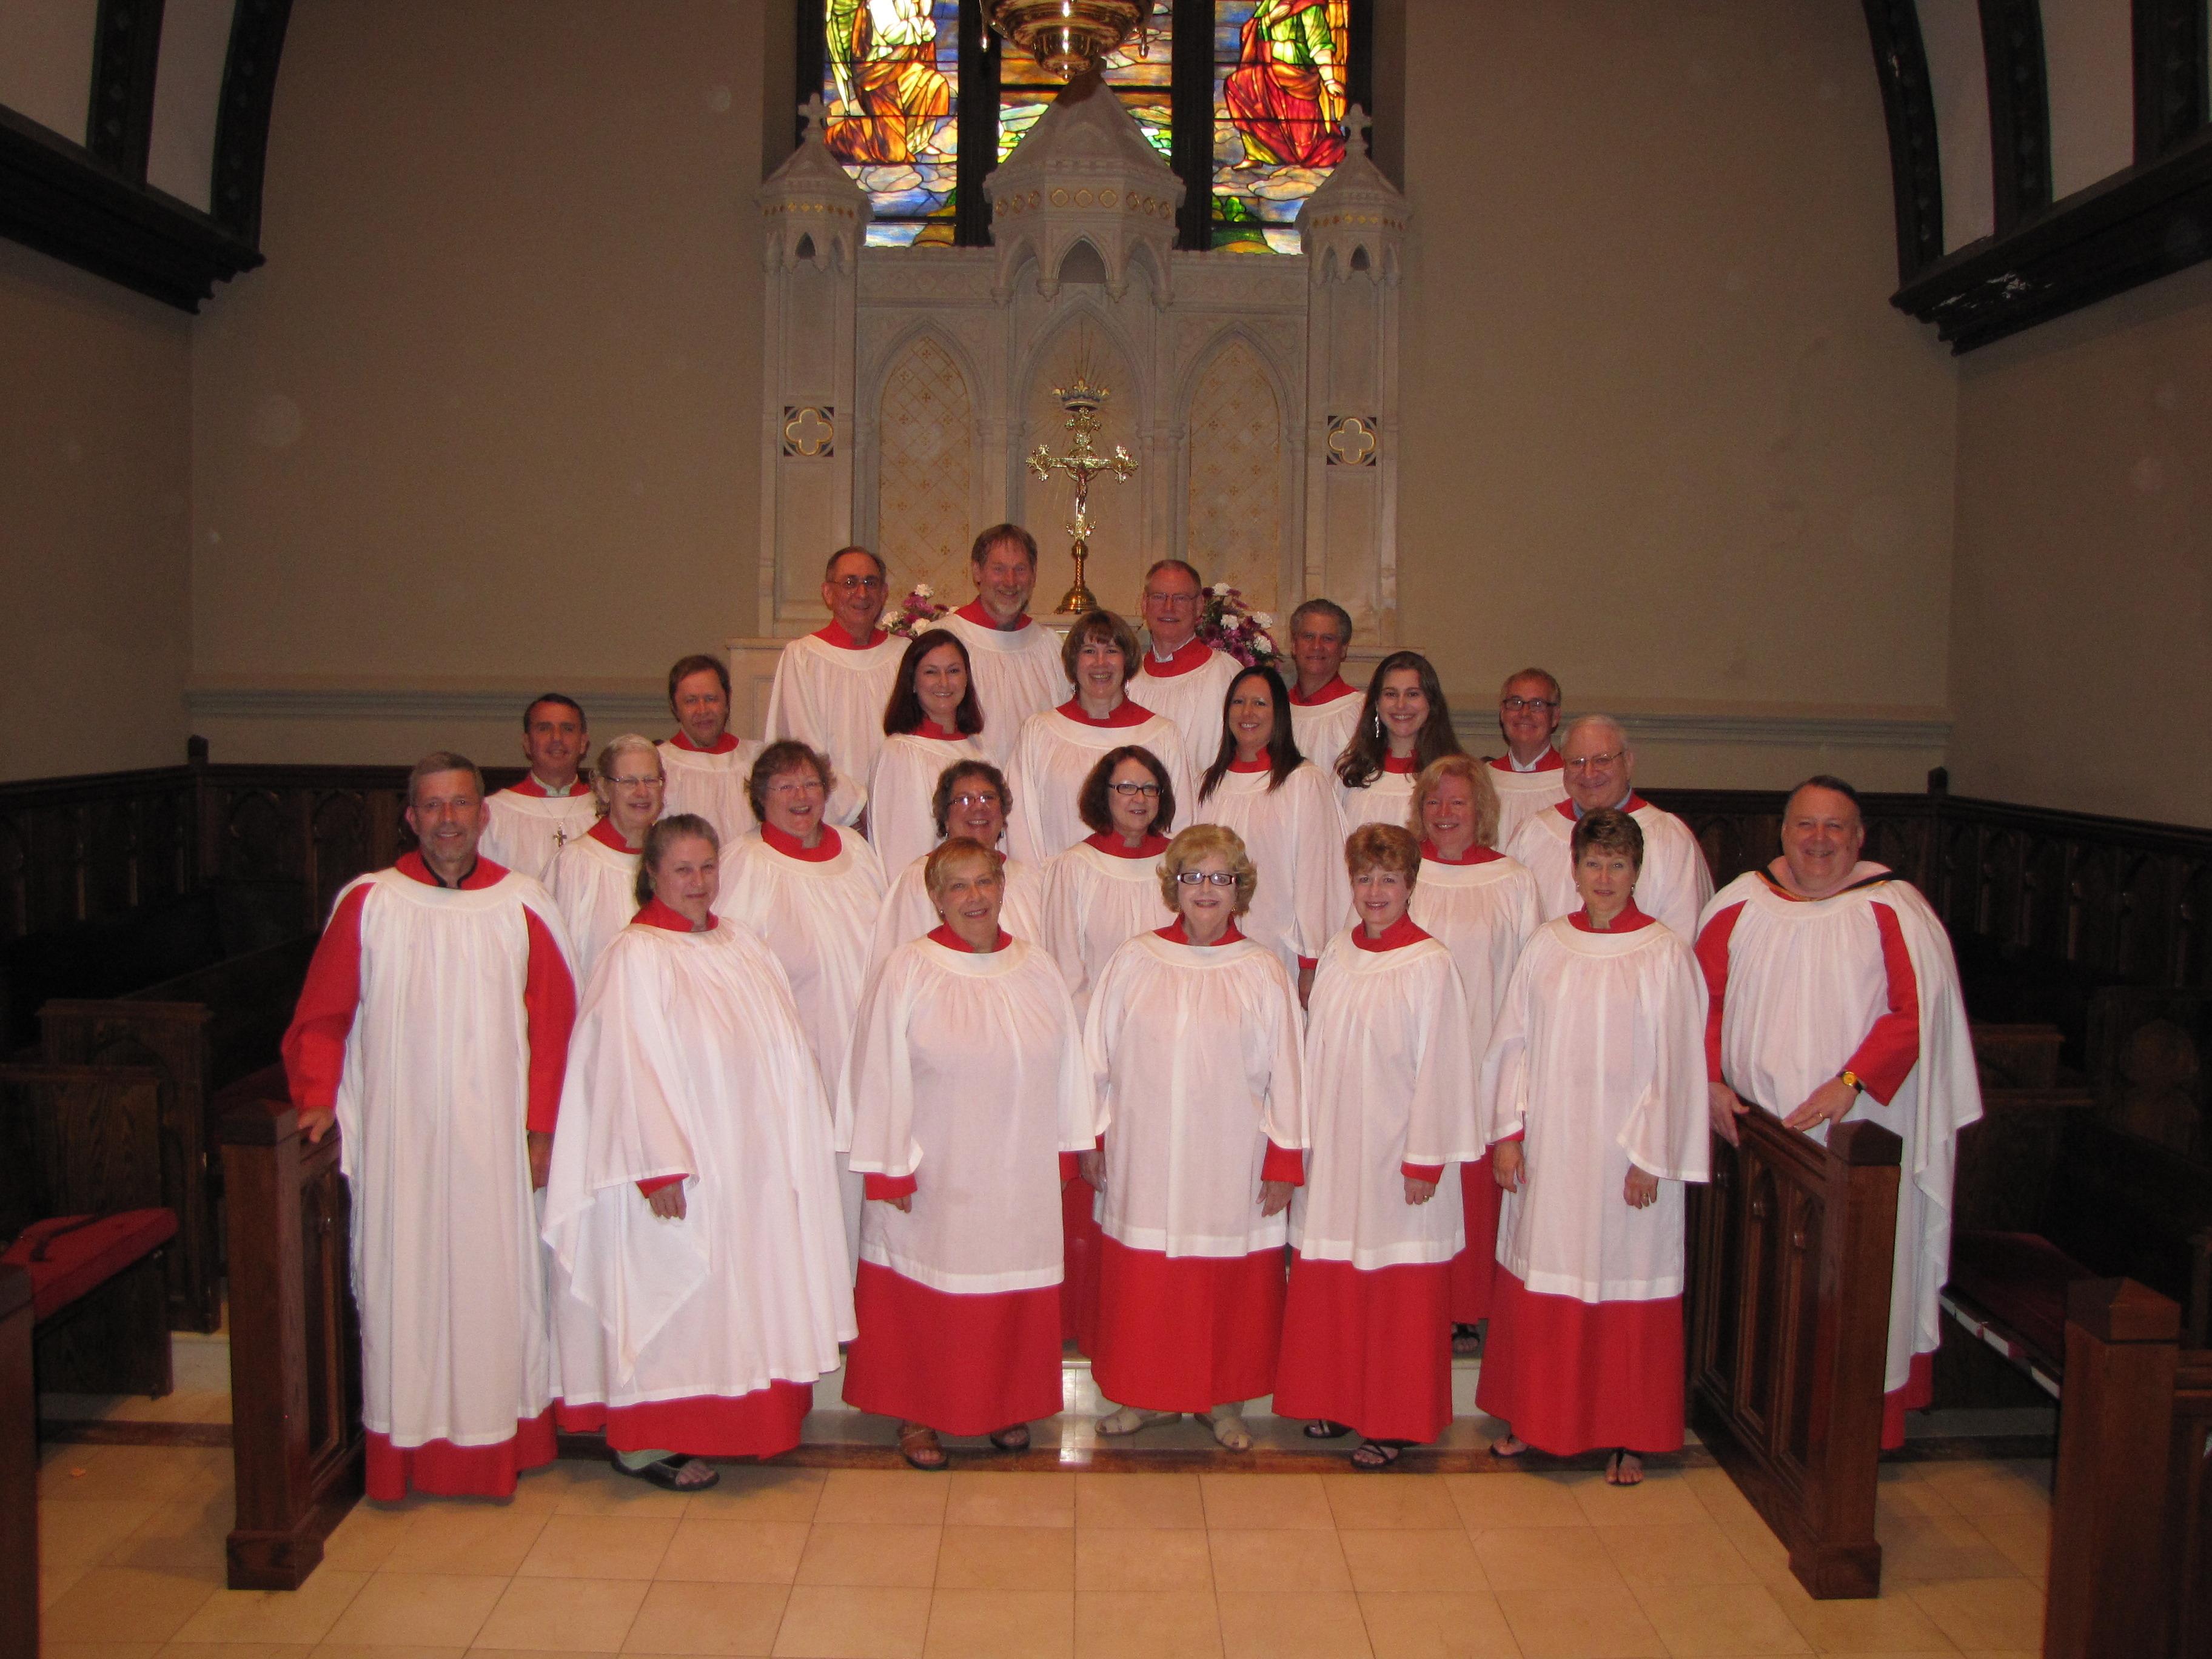 06f8efcc8fa526c81d71_Christ_Church_Senior_Choir.JPG